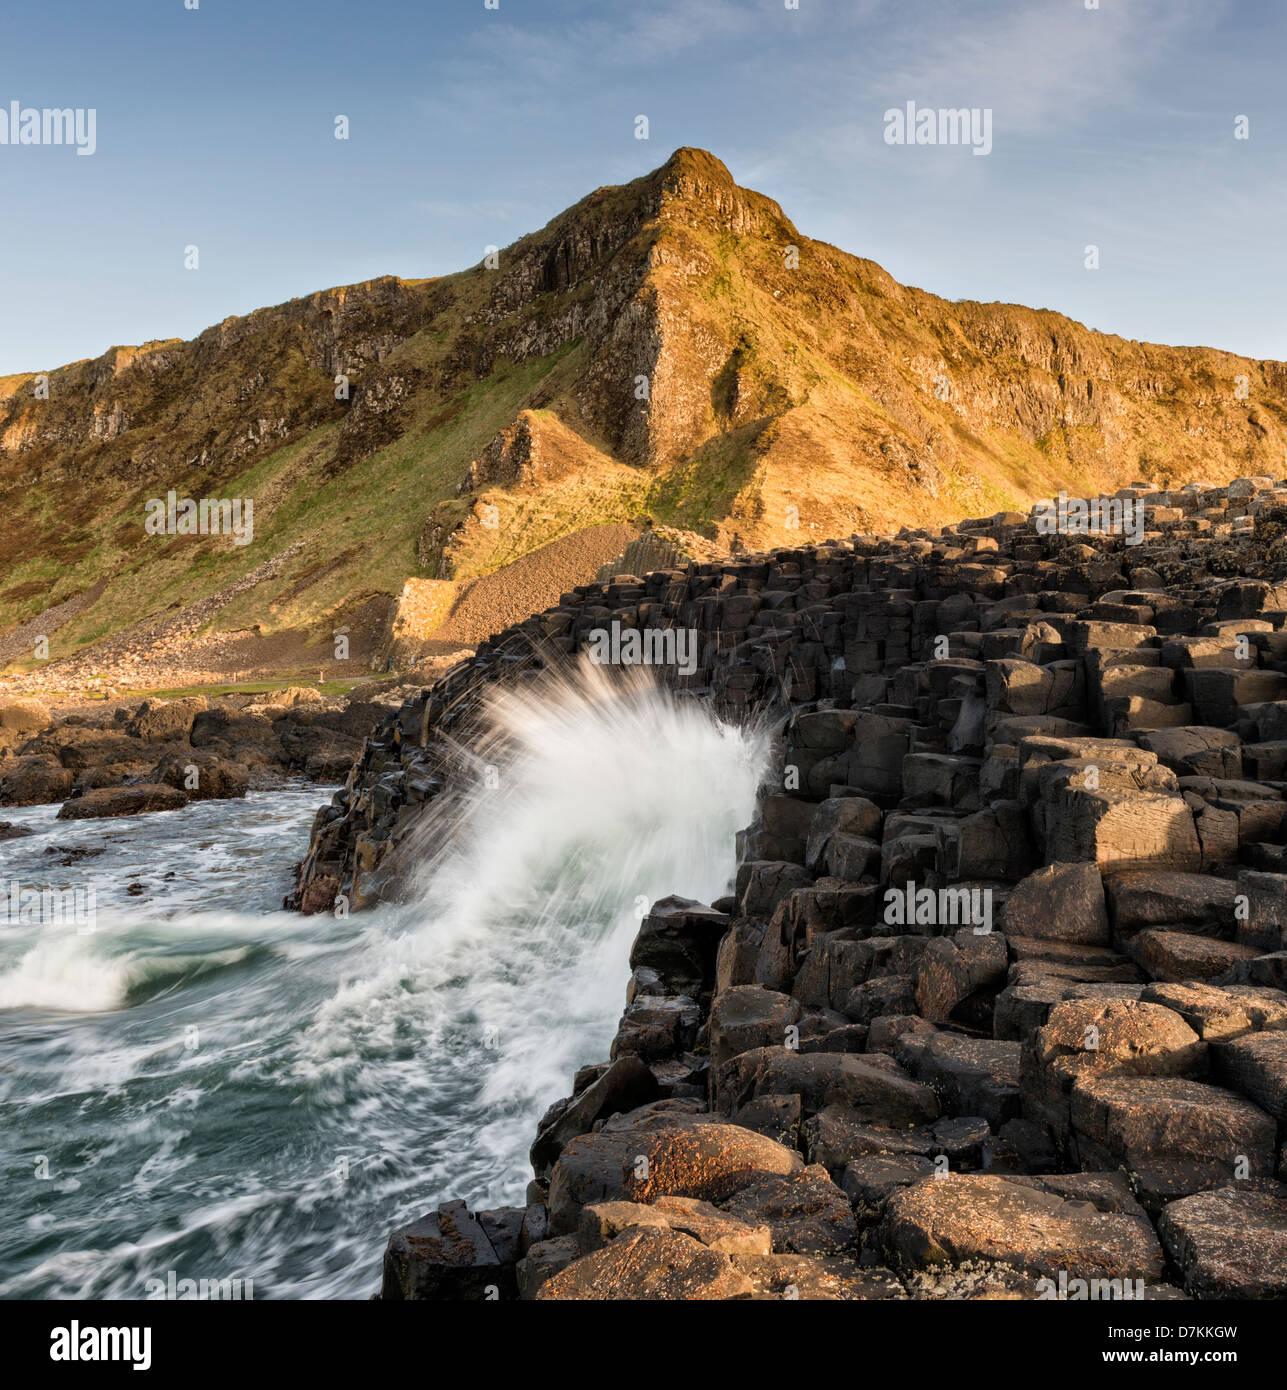 Giant's Causeway on the North Antrim coast of Northern Ireland - Stock Image